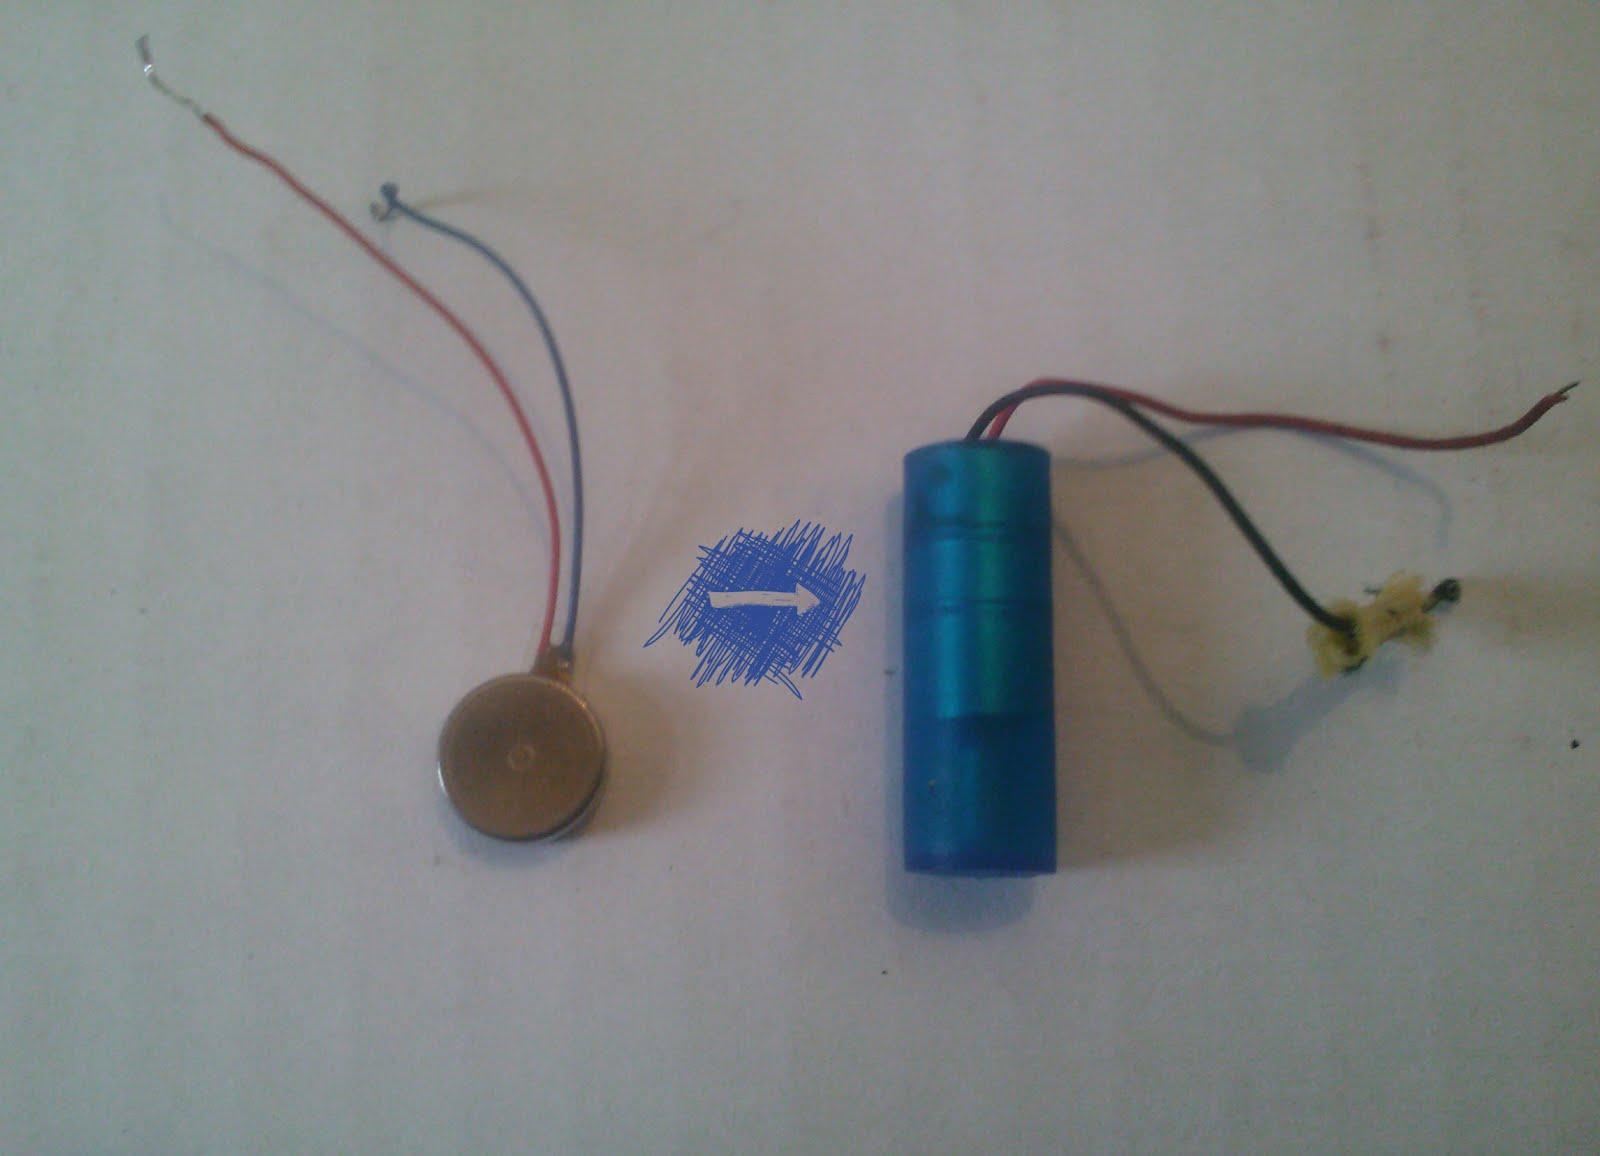 Visparsh Better Haptic Feedback Using New Vibration Motors